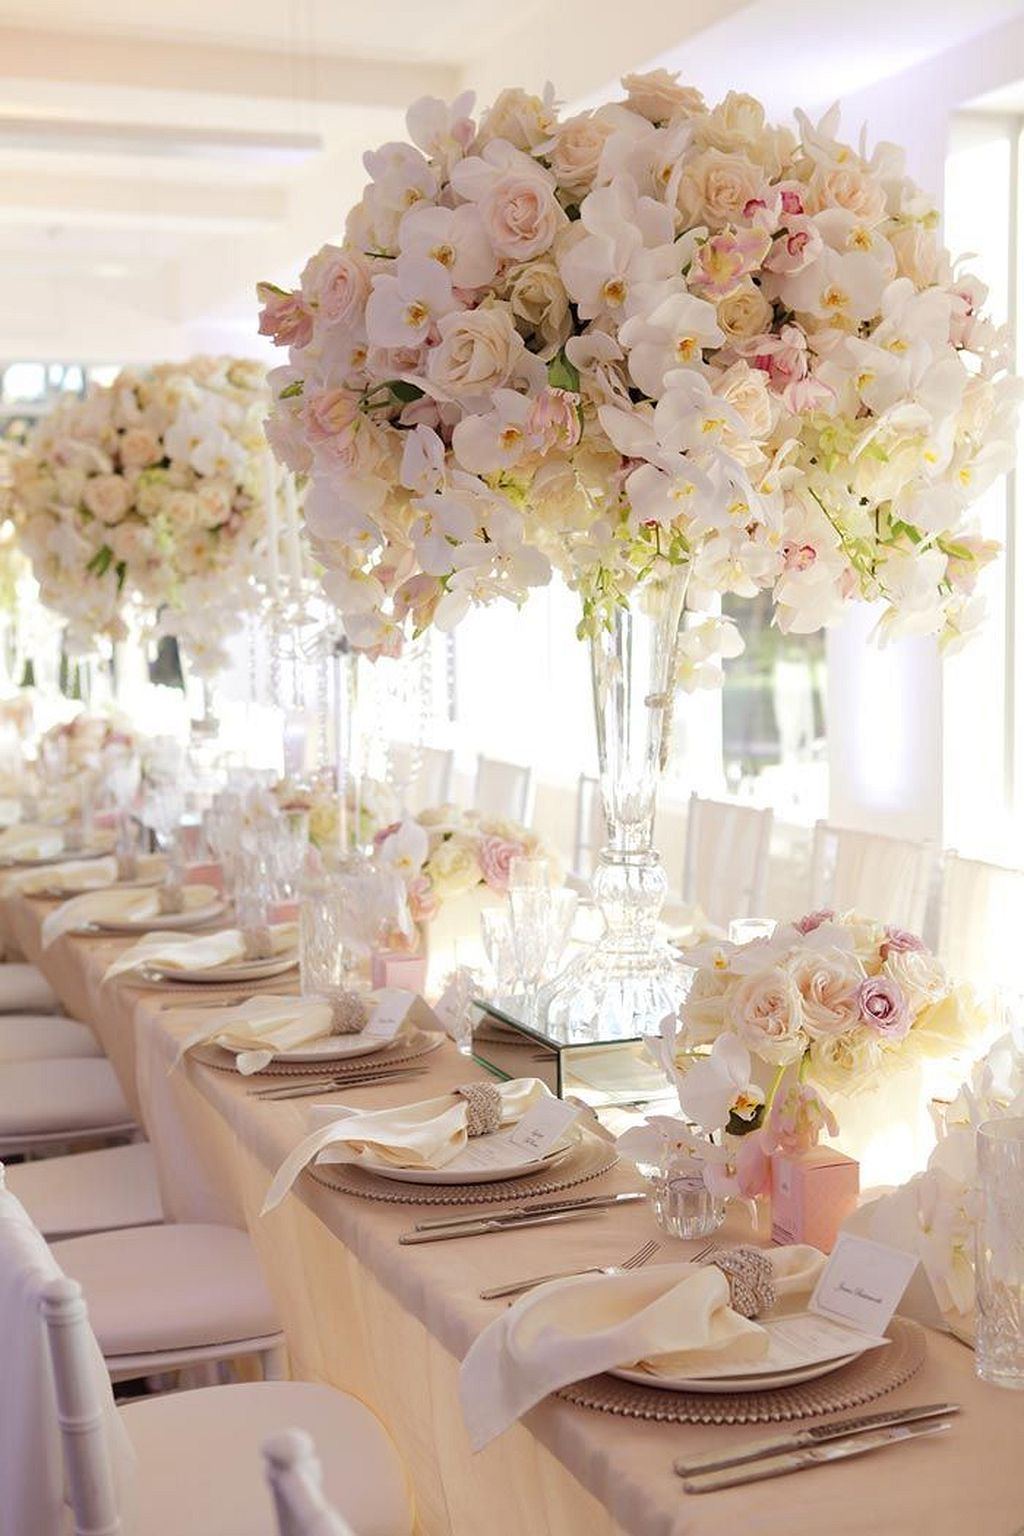 120 elegant floral wedding centerpiece ideas 101 | Pinterest ...